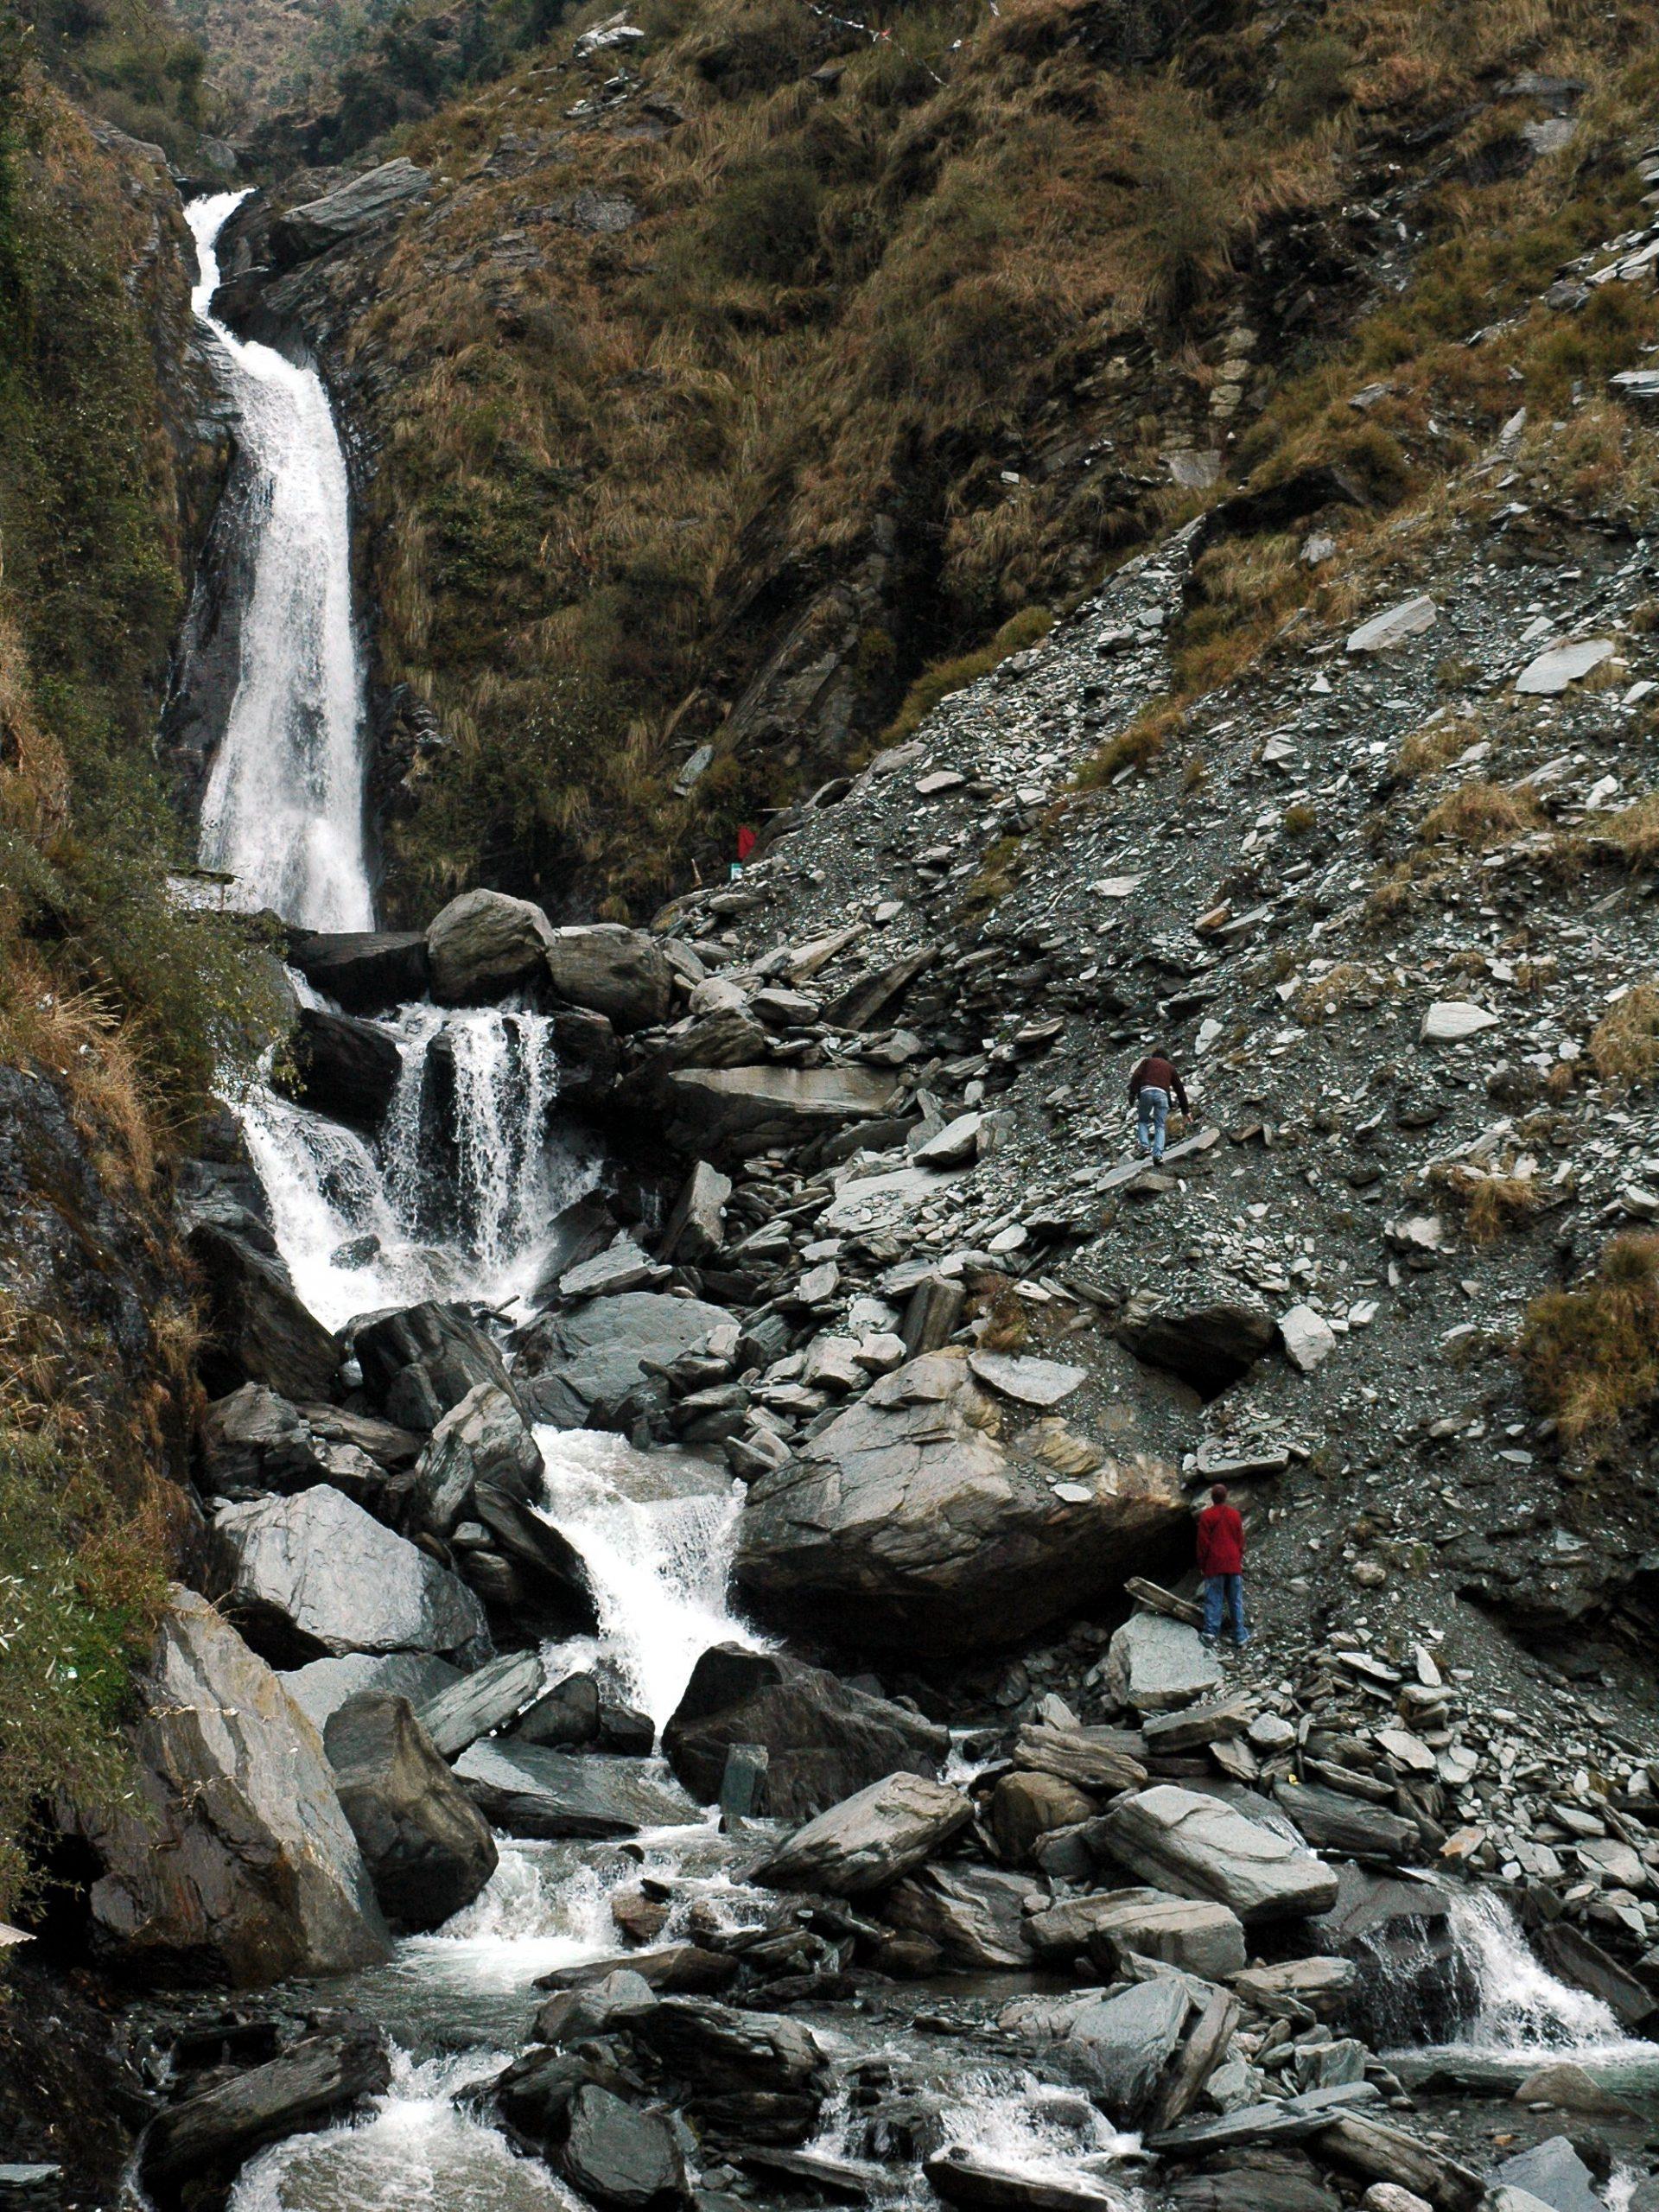 Must-Visit Place in Dharamshala and McLeodganj - Bhagsunag Waterfall